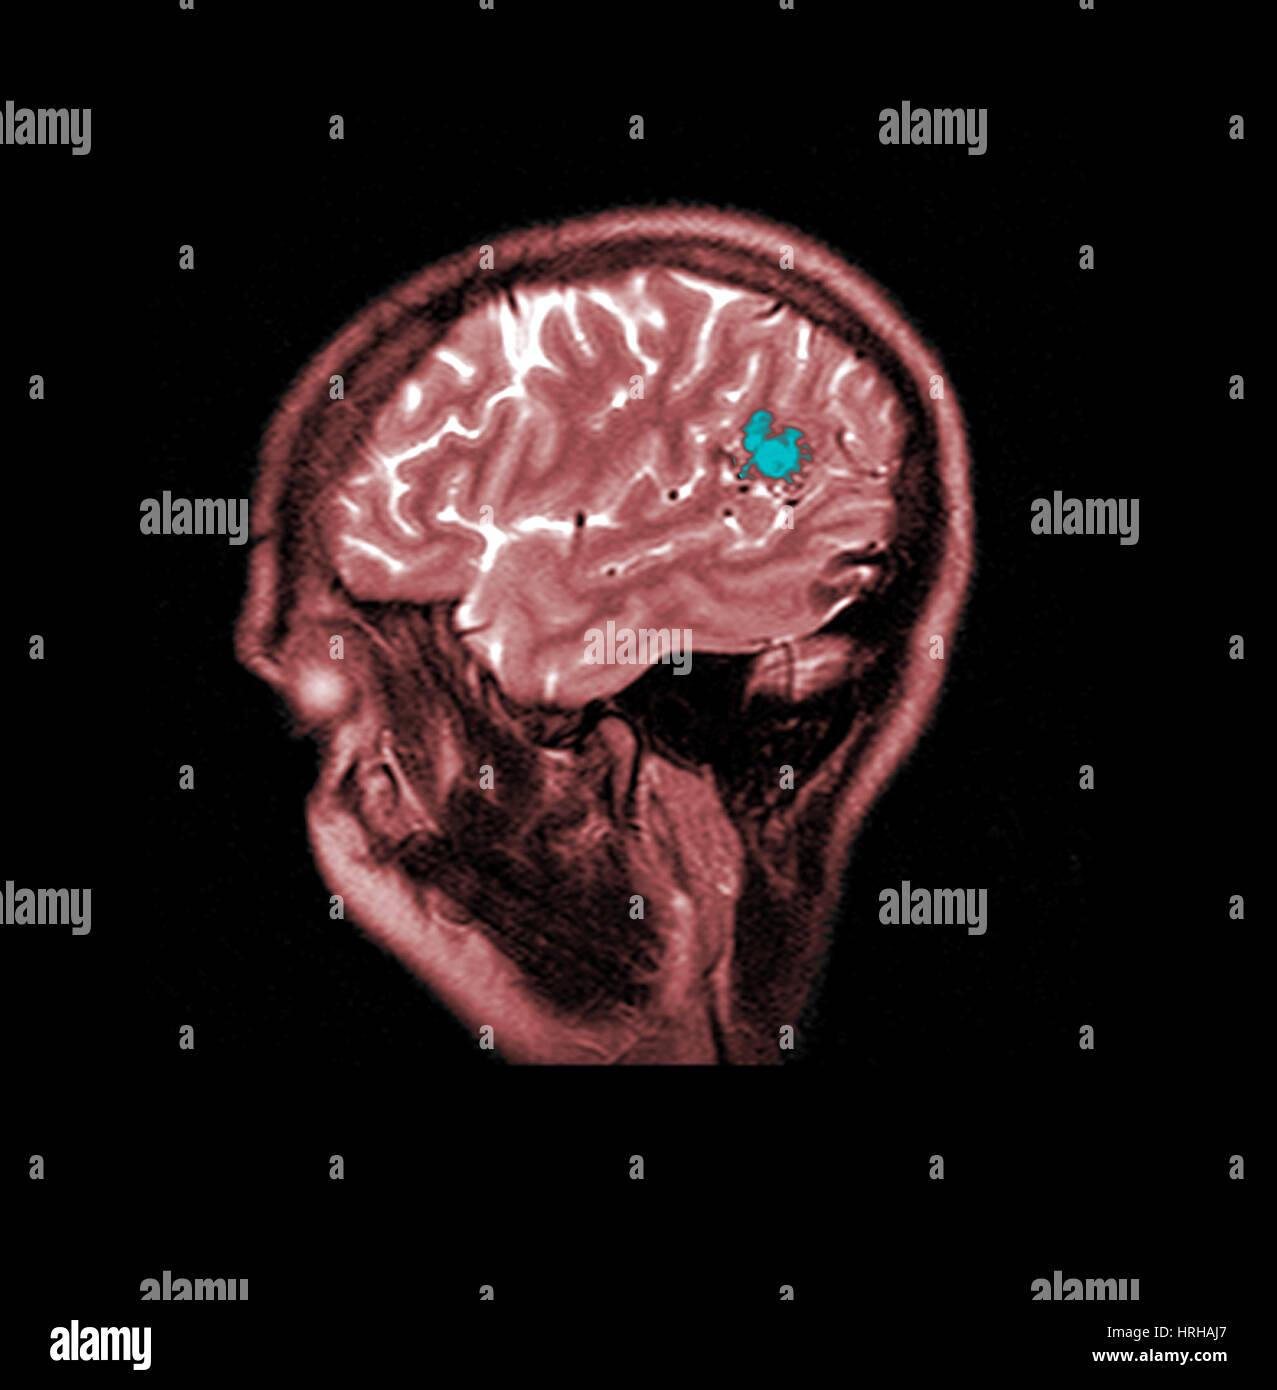 Abnormal Mri Brain Stock Photos & Abnormal Mri Brain Stock Images ...